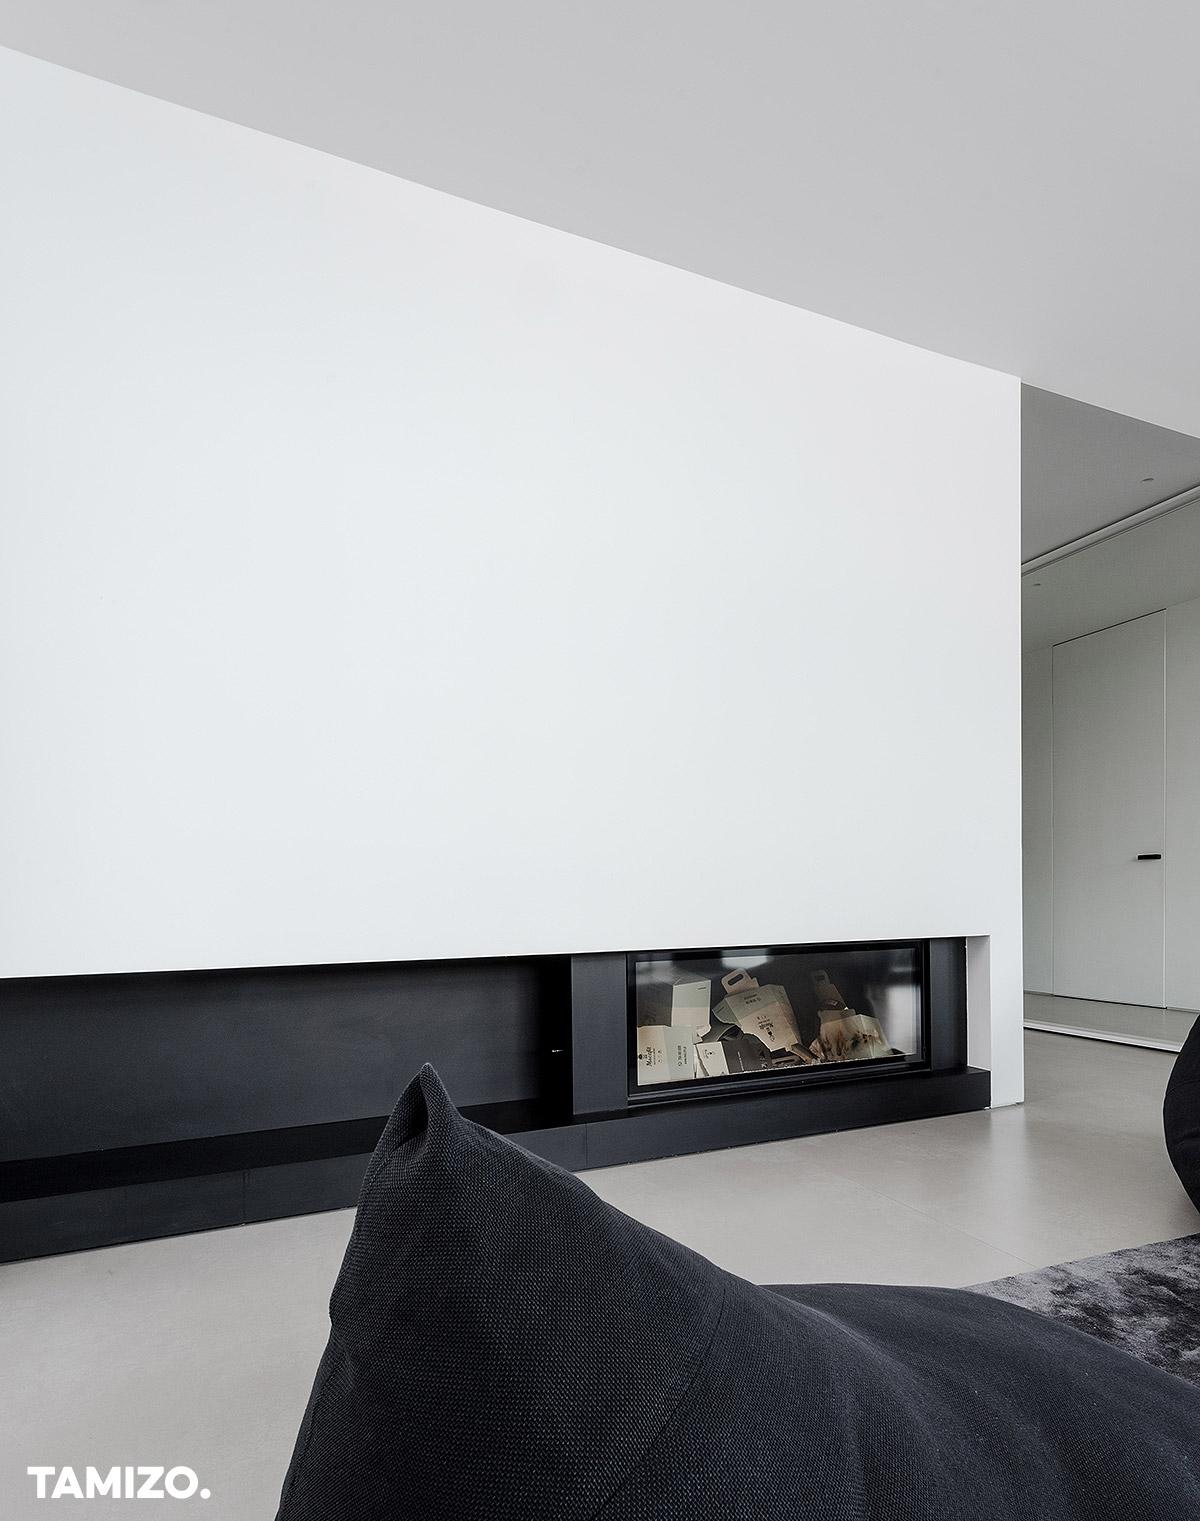 008_tamizo_architects_interior_house_realization_warsaw_poland_11